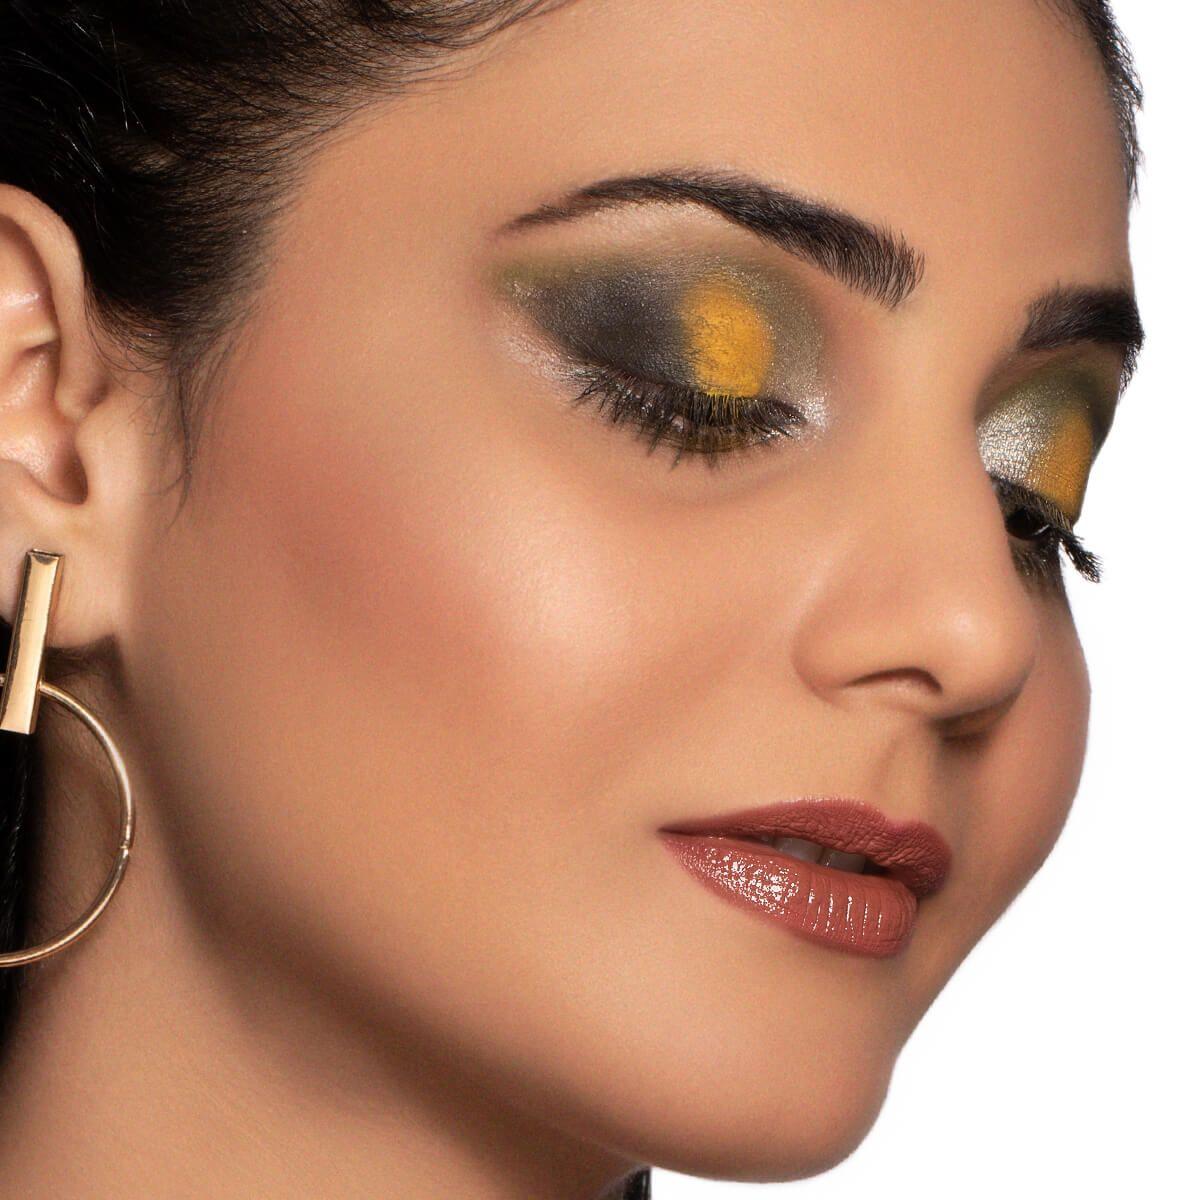 WORLD CUP CRAZE: AUSTRALIA Eye Makeup Look